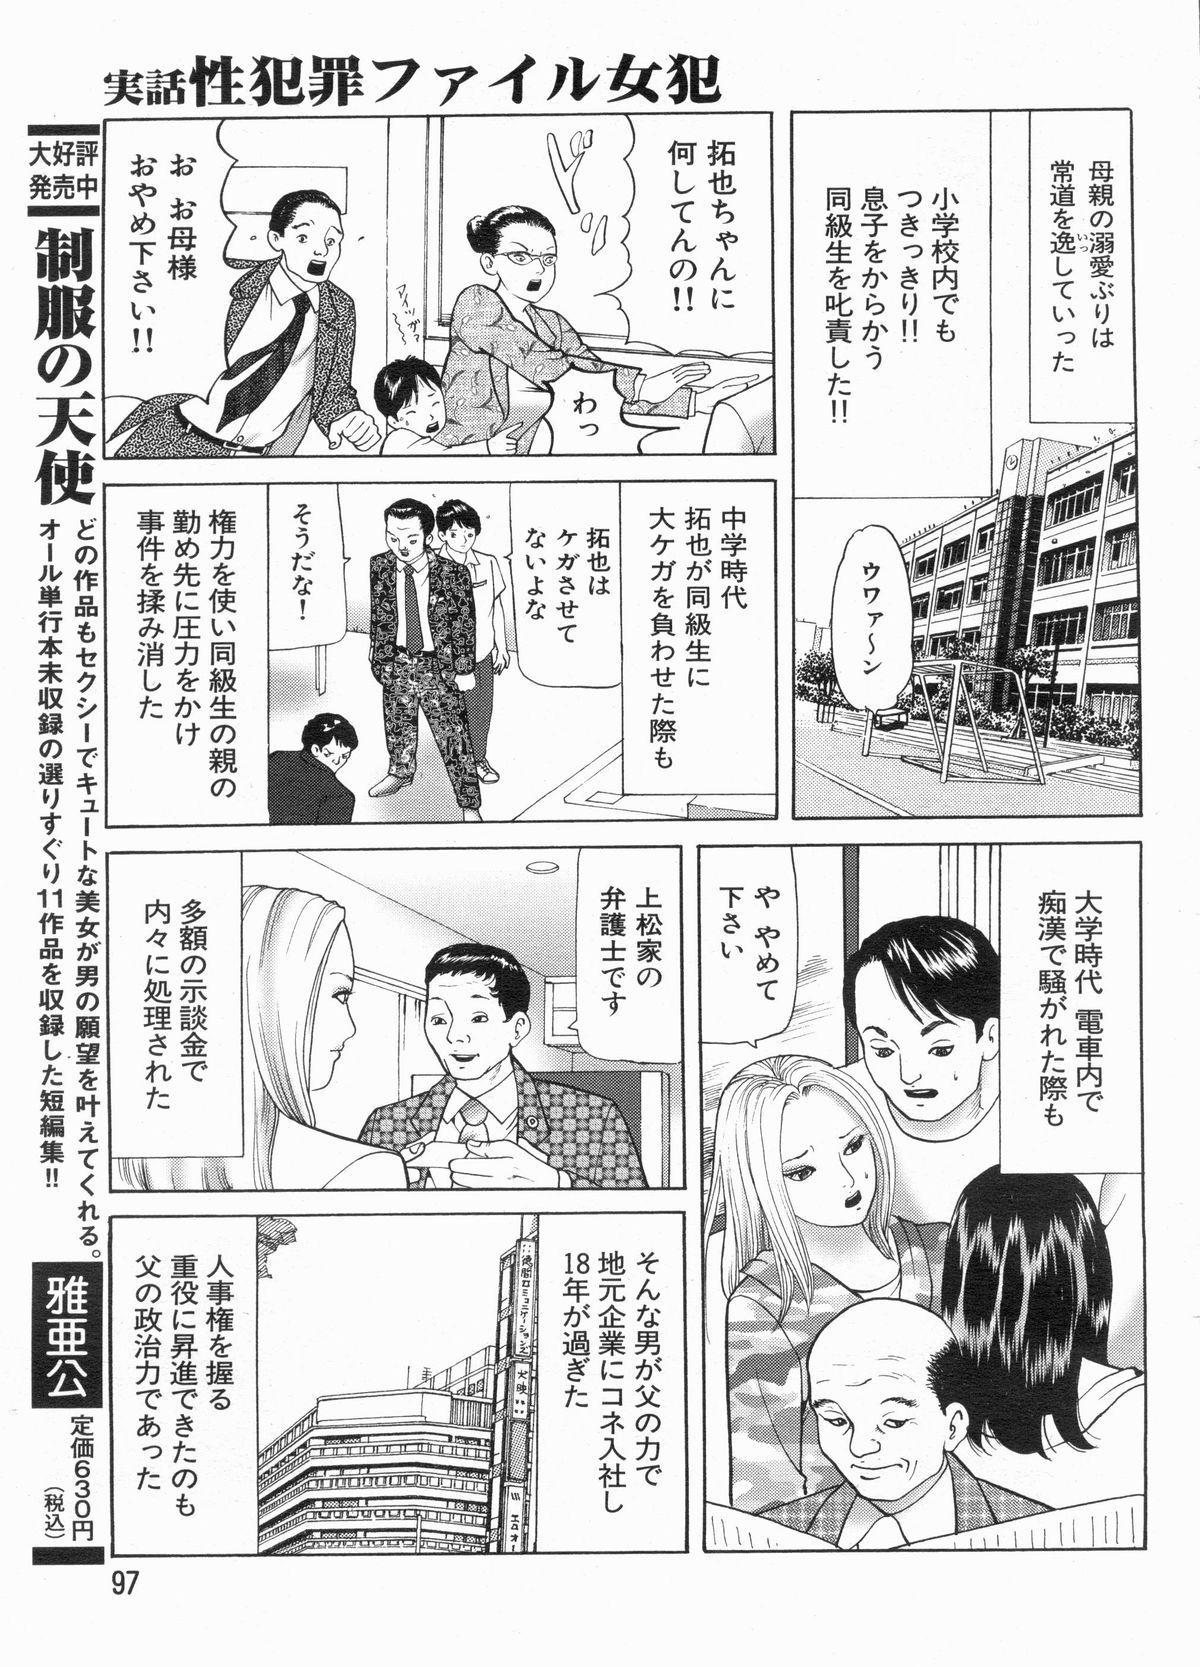 Manga Bon 2013-03 95